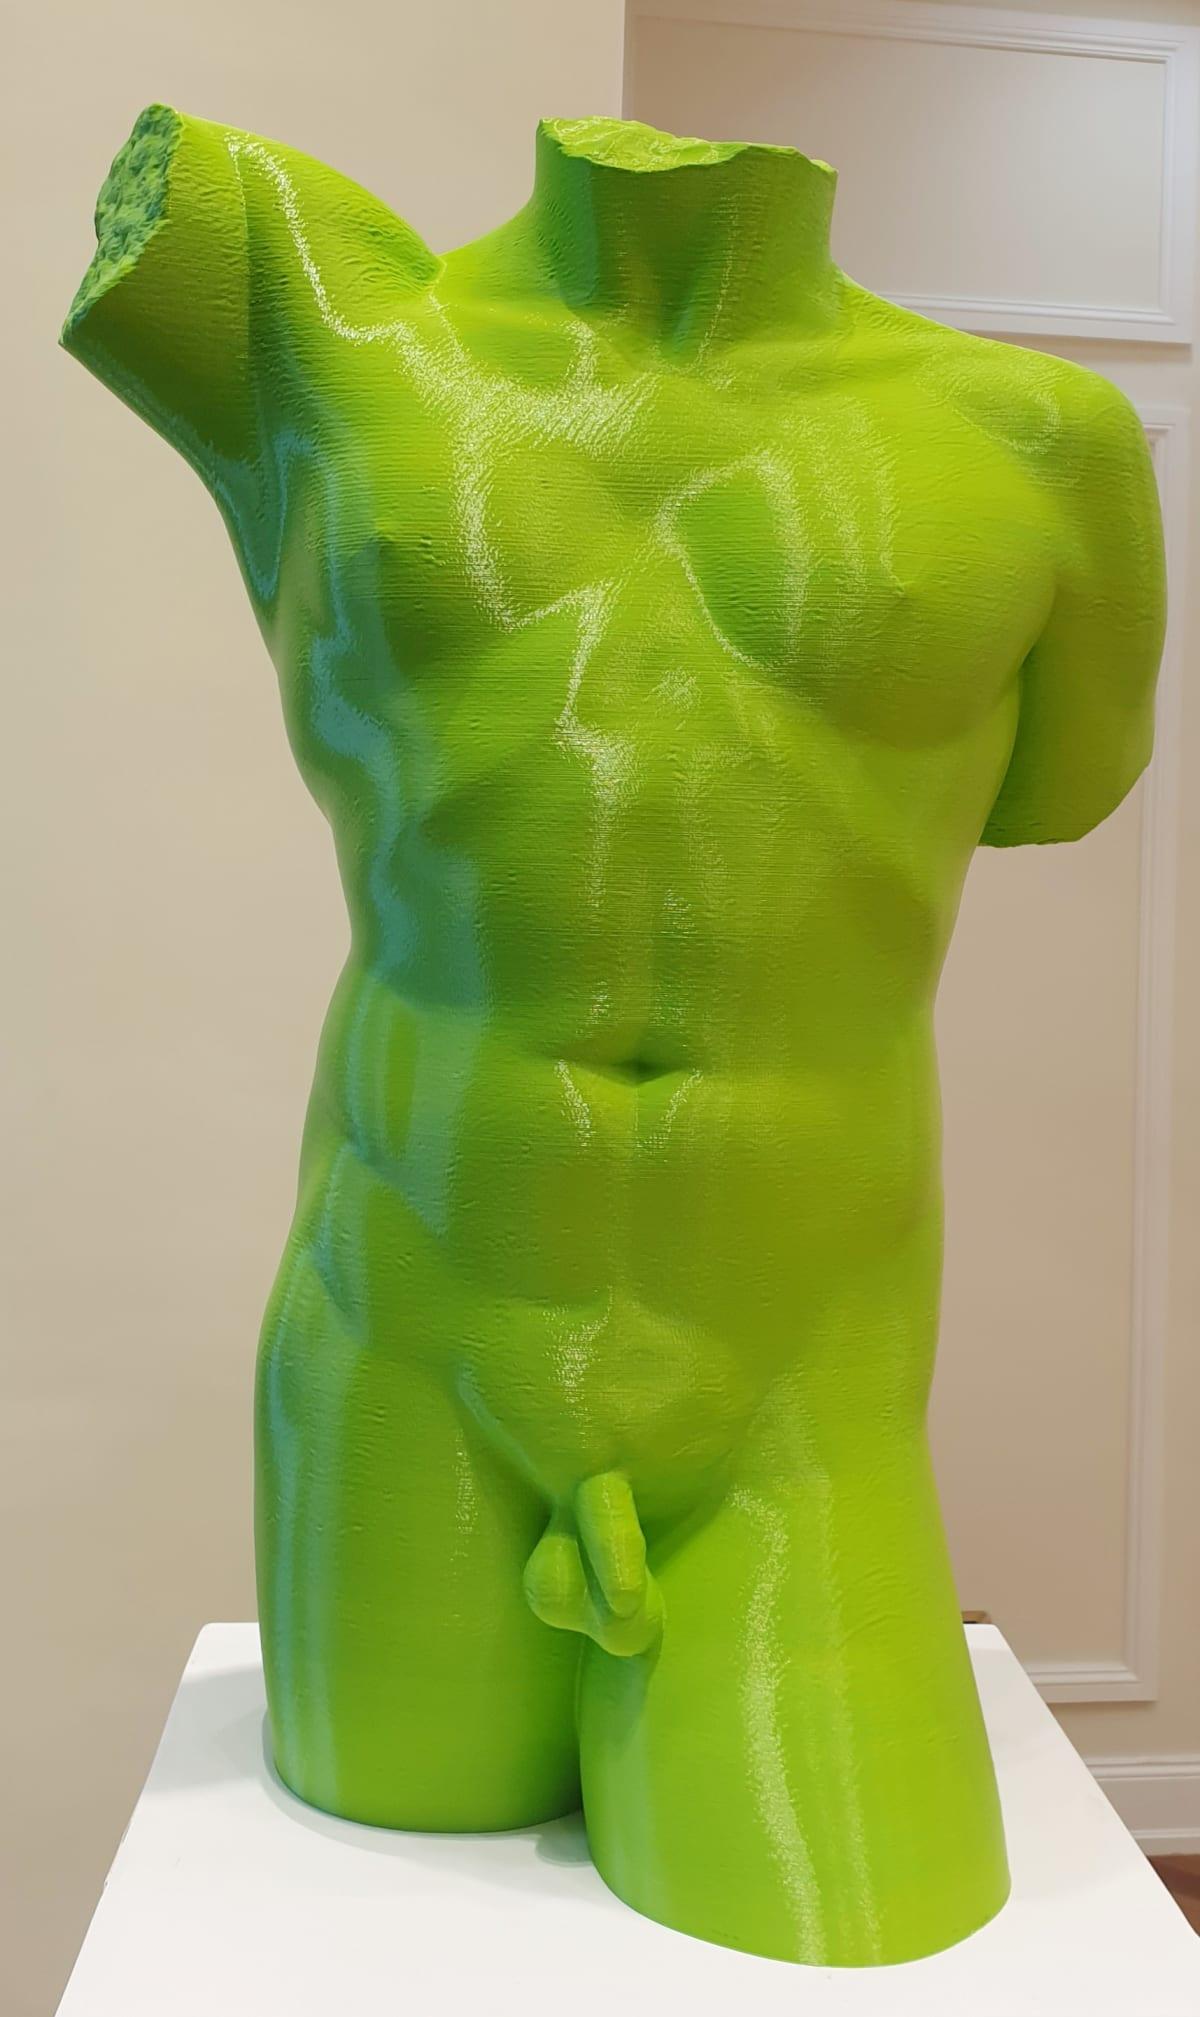 ArtFicial Clones, Bust of Man, 2020